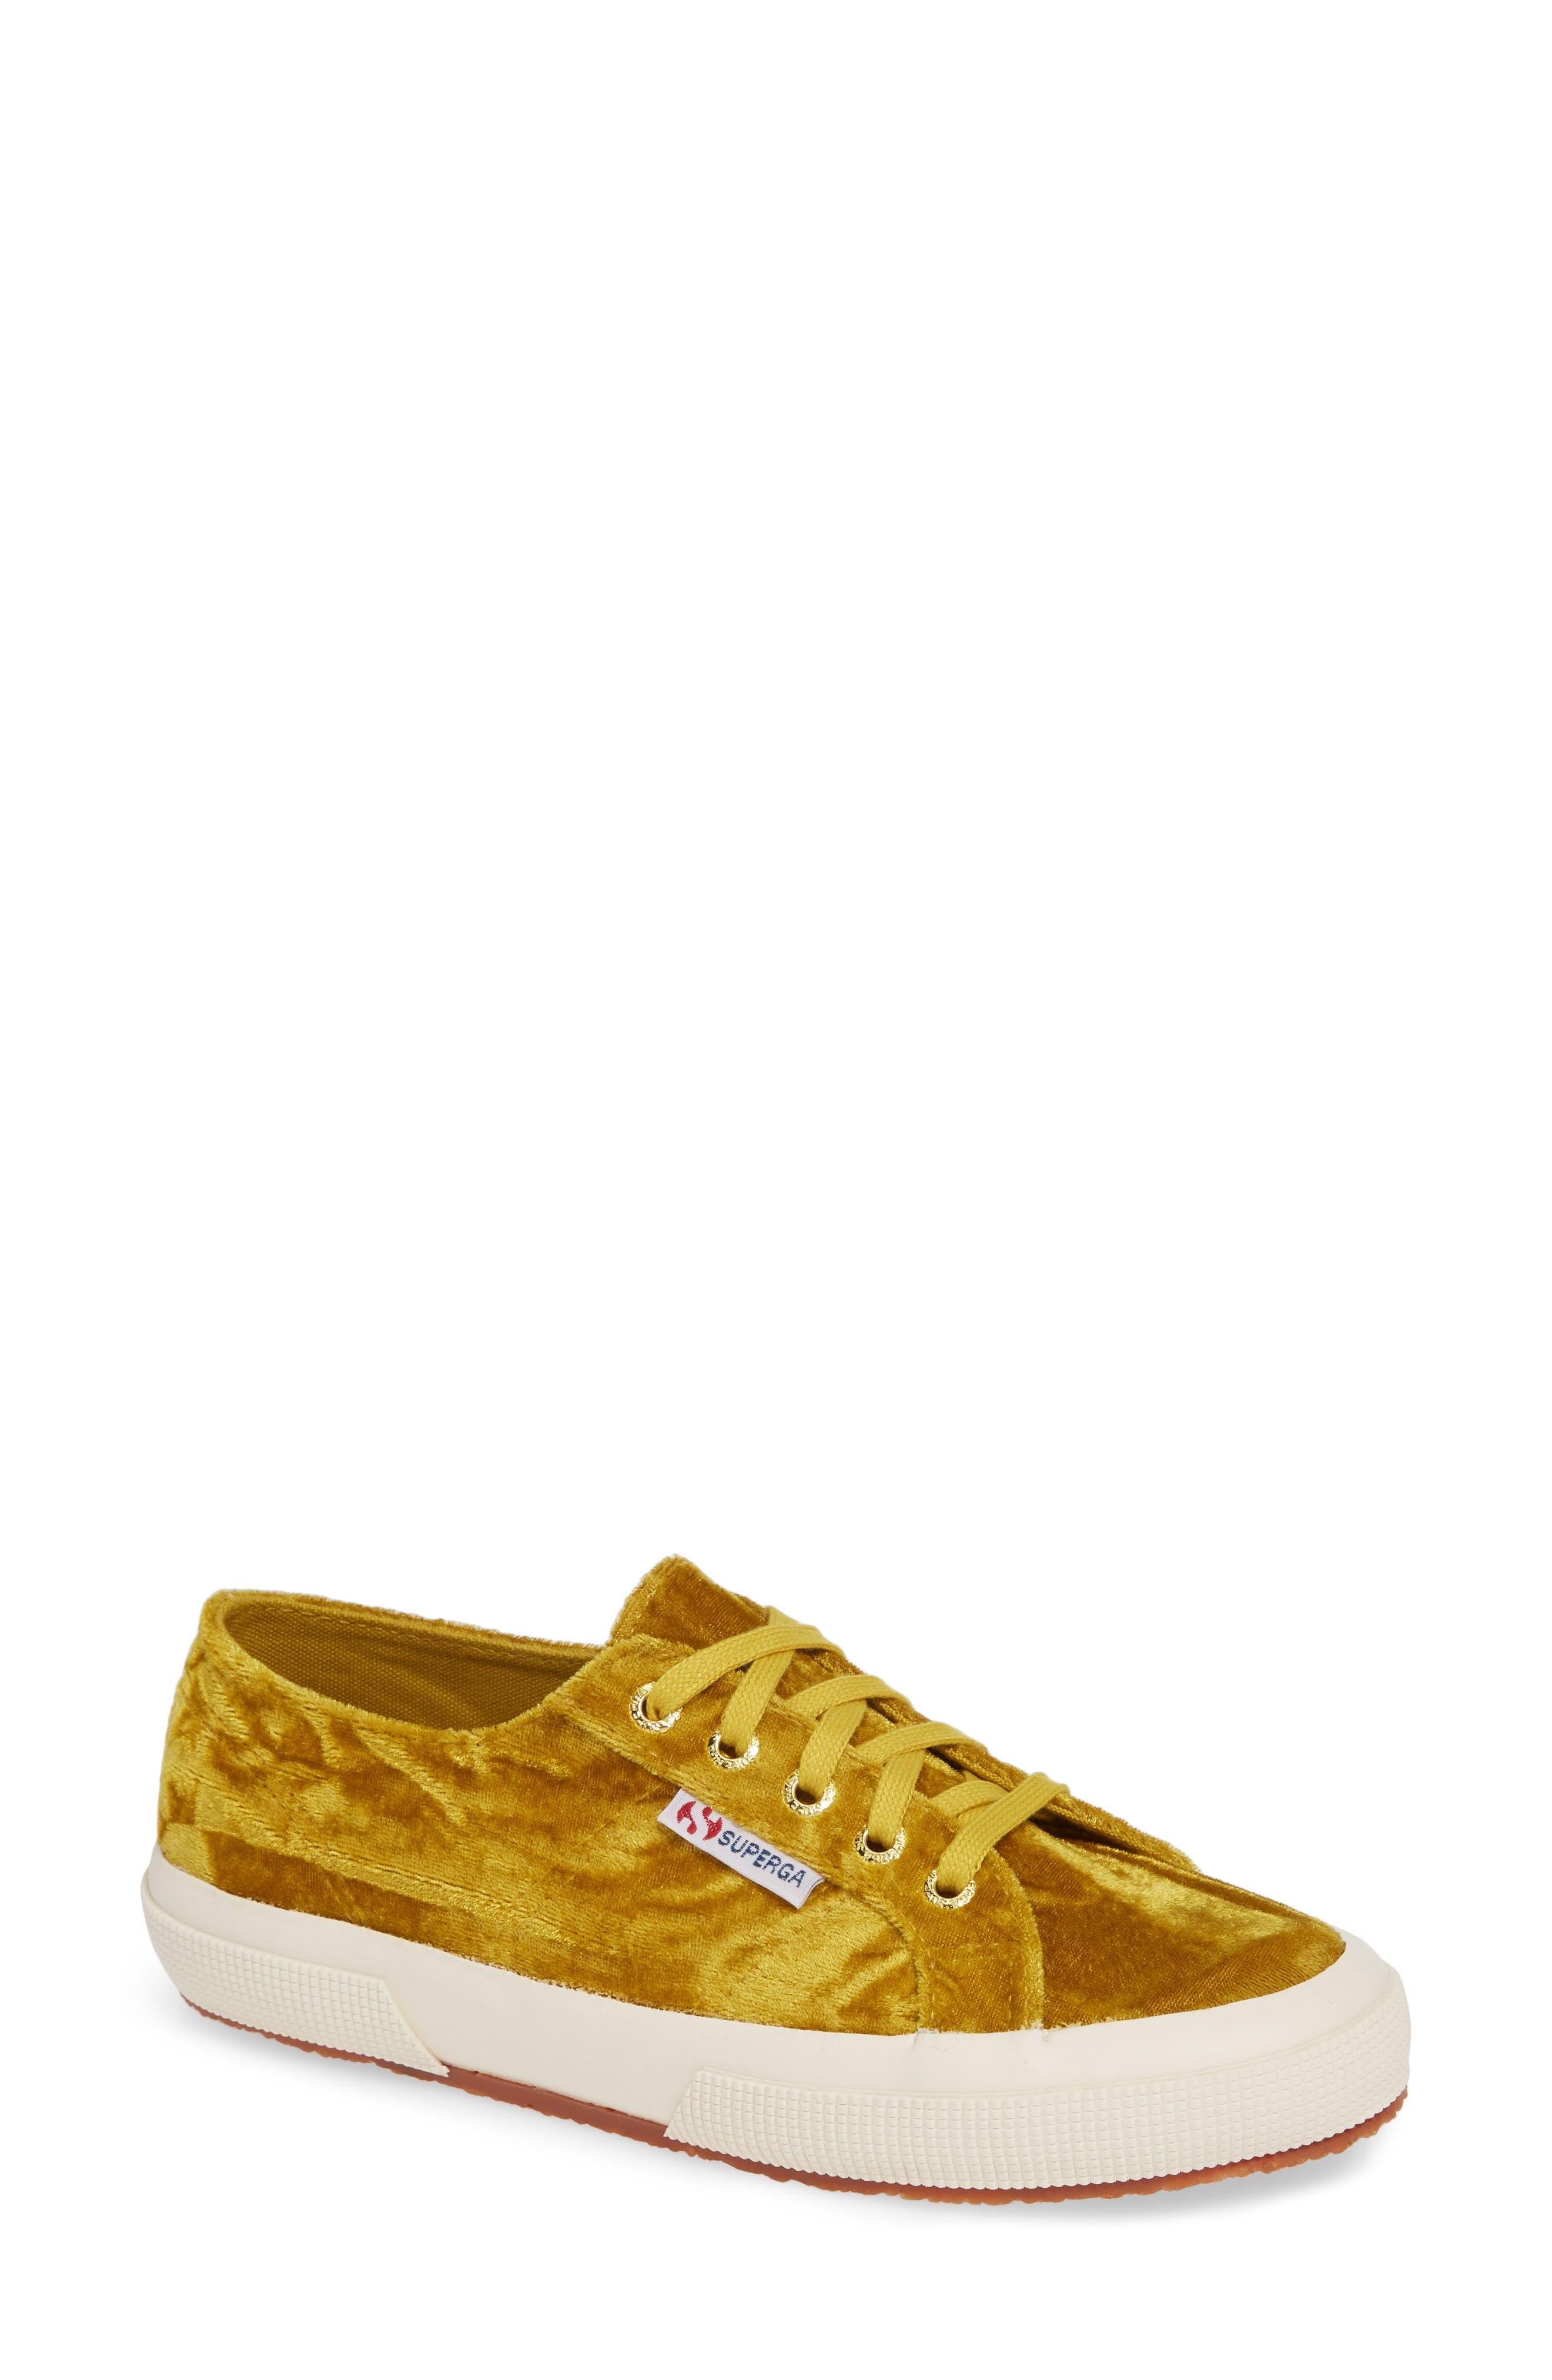 SUPERGA 2750 Sneaker, Main, color, 700